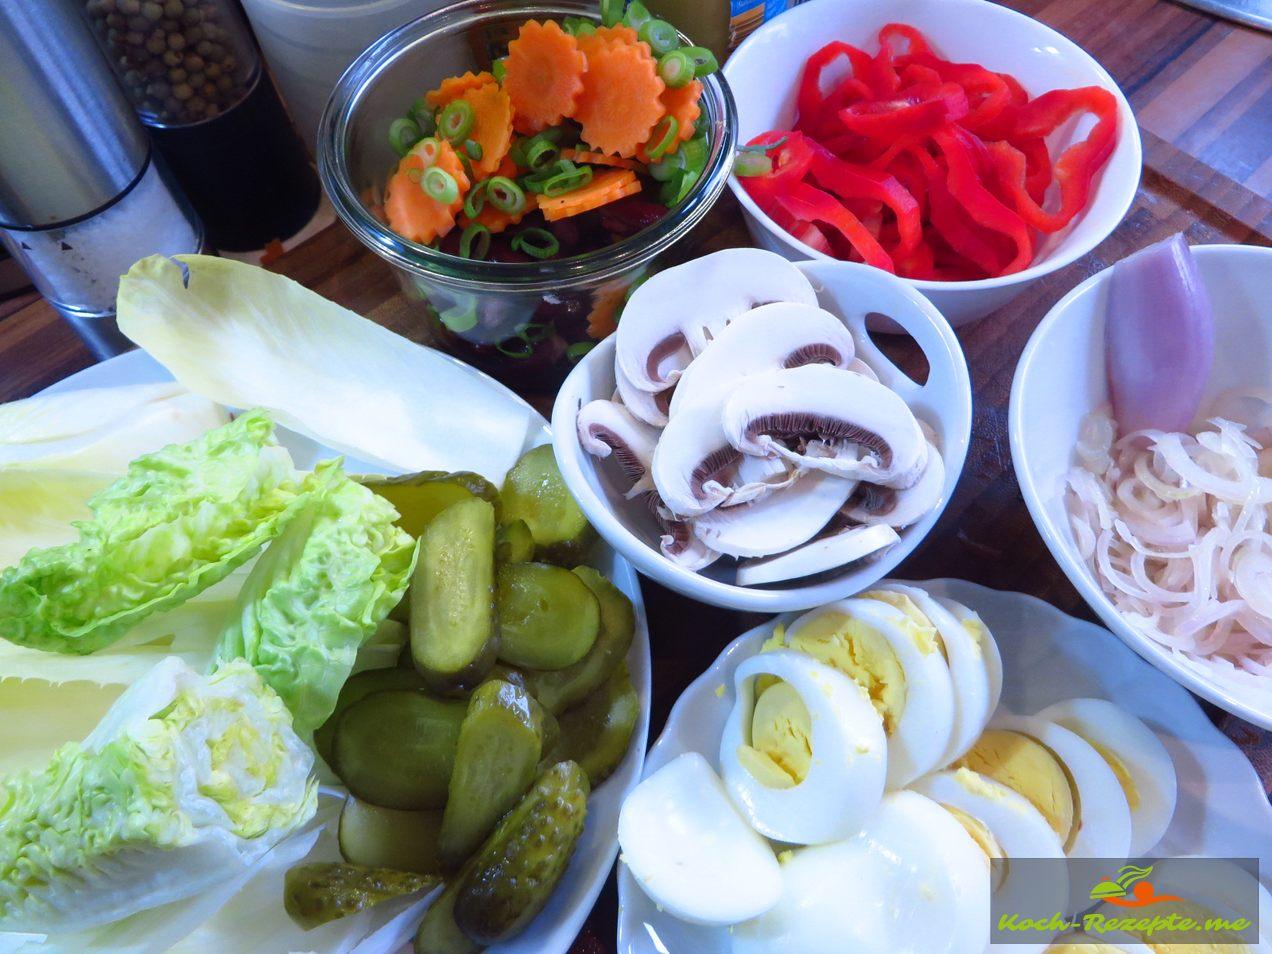 Alle Zutaten Mundgerecht geschnitten gekochte Eier,Champignons,Möhre, Frühlingszwiebelgrün,Paprika, Kidnaybohnen, Chalotten, Chicorée